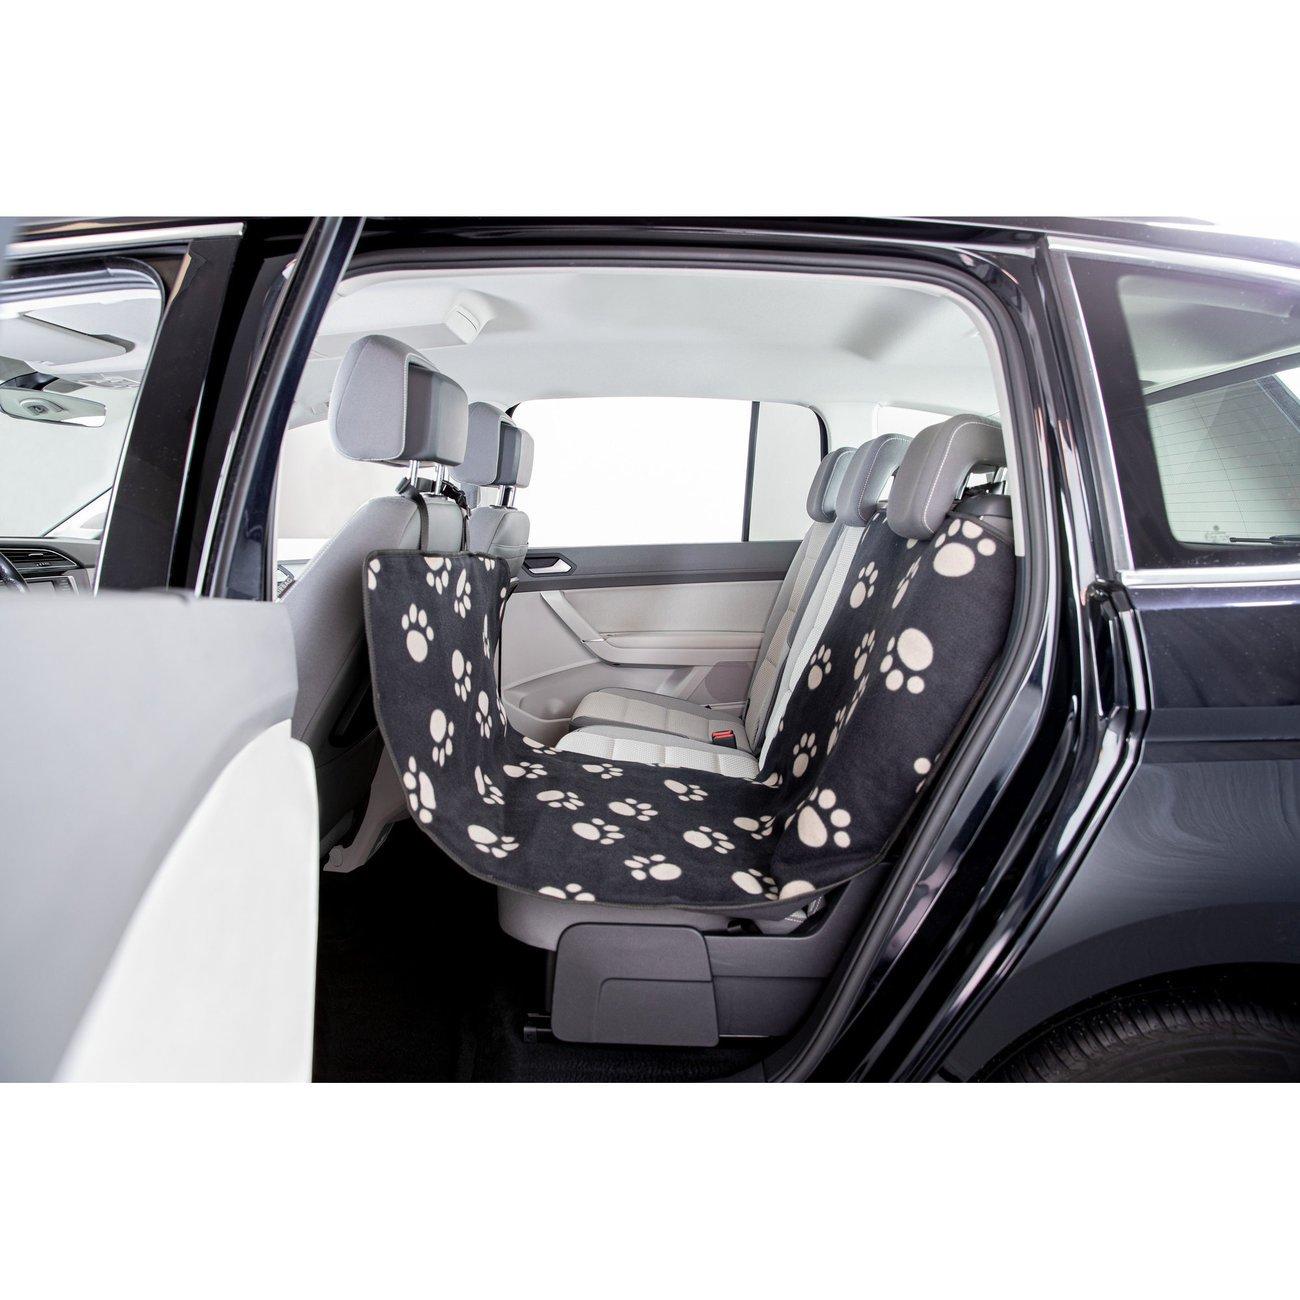 TRIXIE Hundedecke Autositz Pfotenmotiv Preview Image